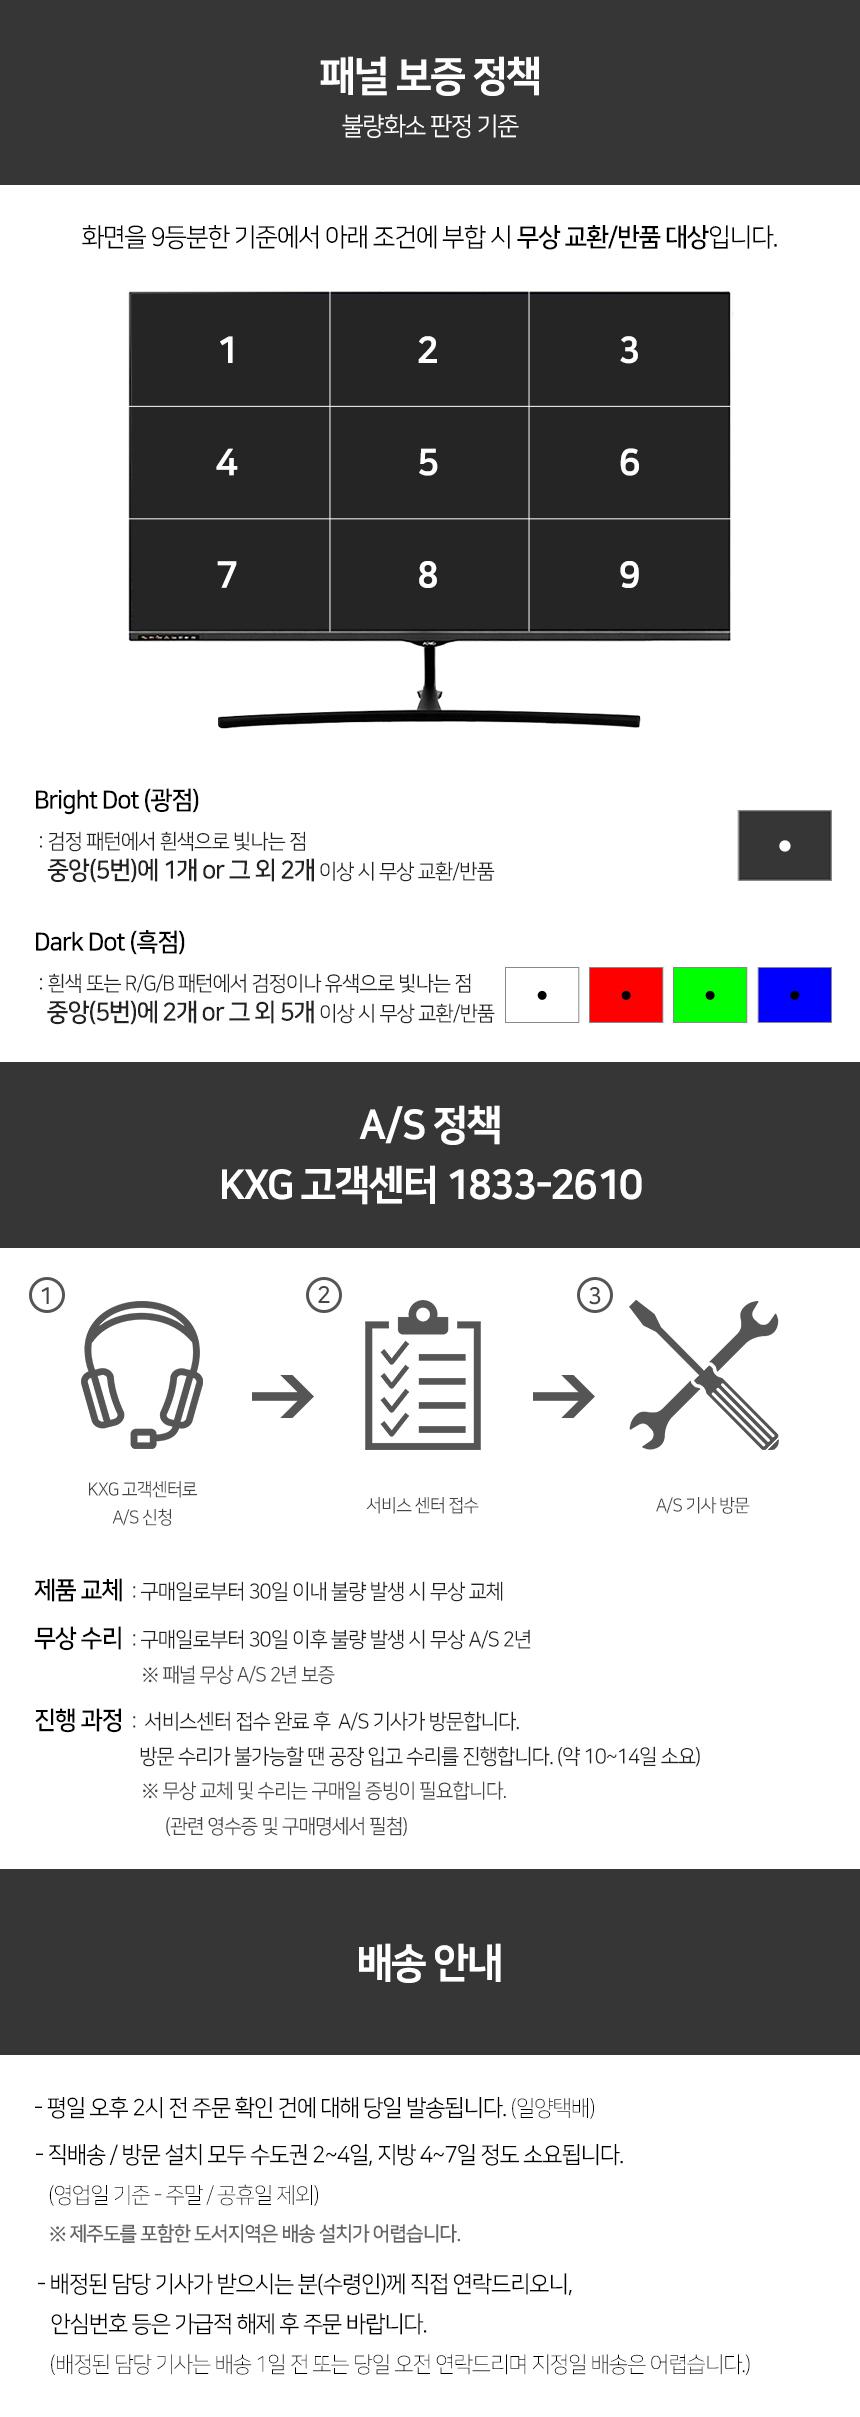 KXG 아트 MO55ART UHD HDR